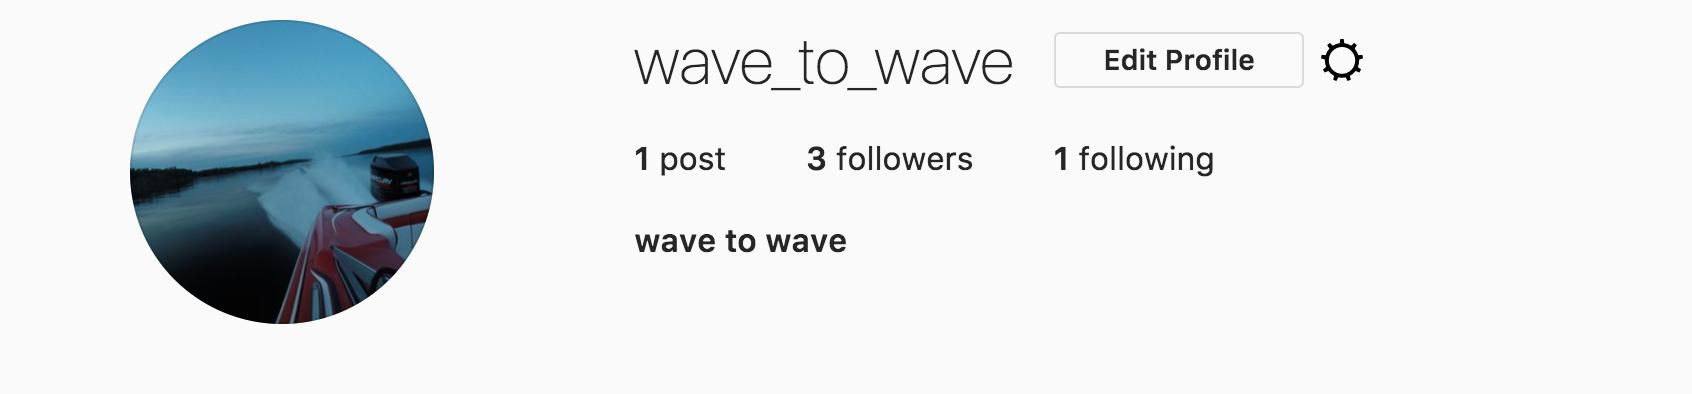 Wave to Wave Instagram